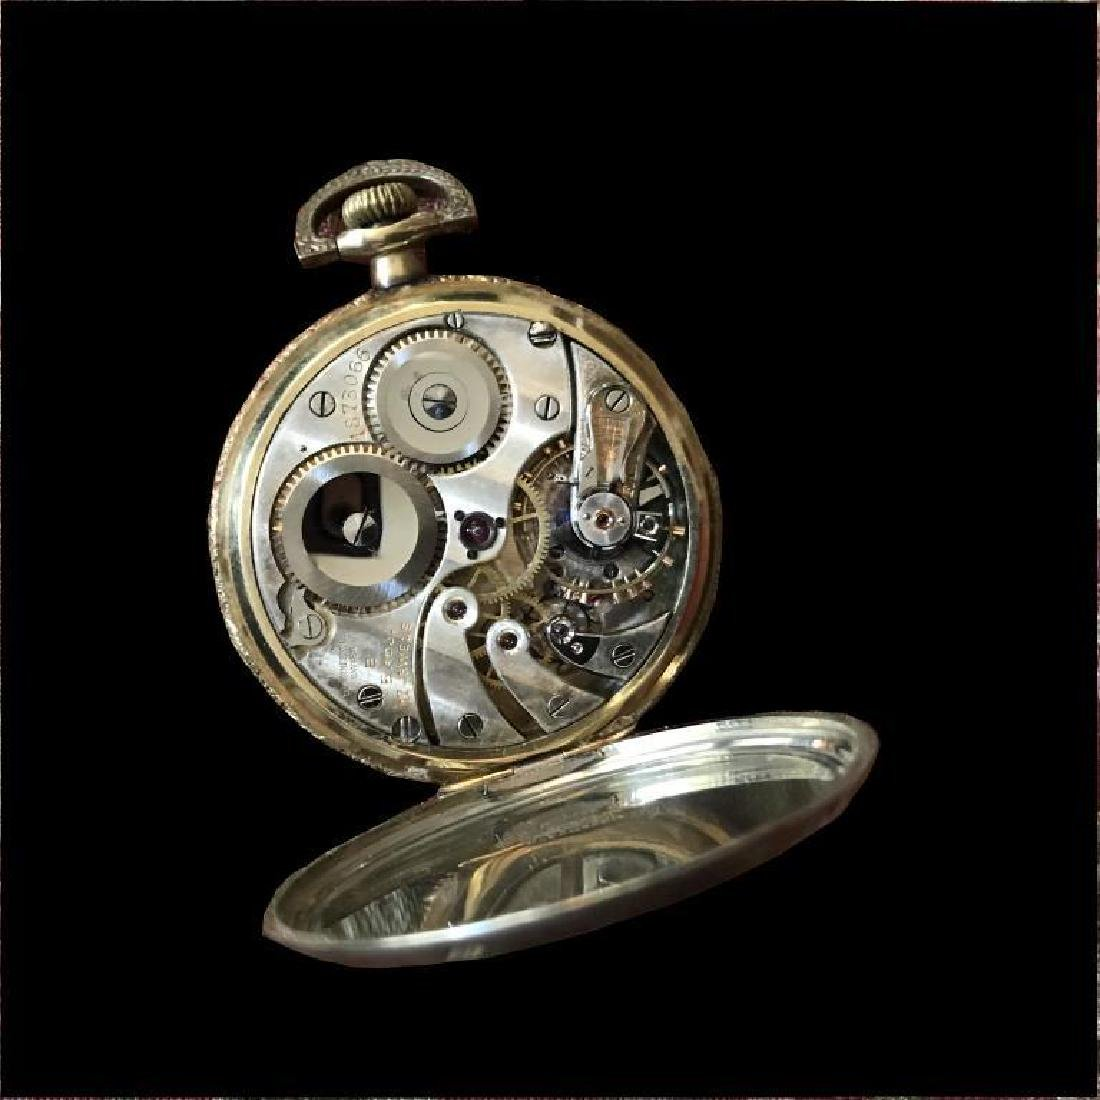 1905 Longines 17 Jewels Gold Filled Pocket Watch - 4